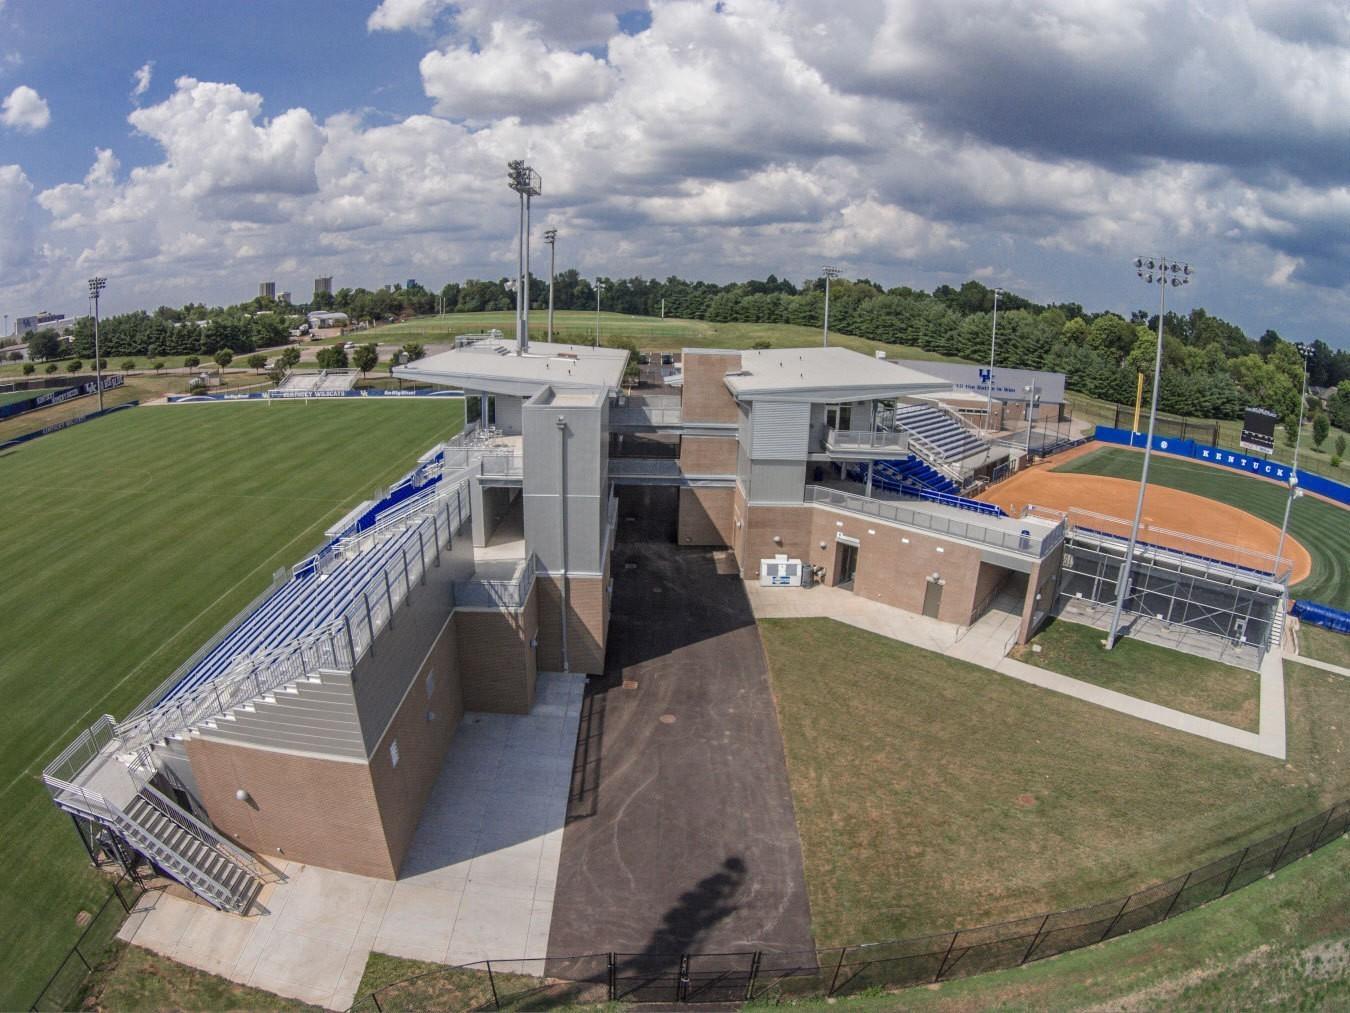 university-of-kentucky-john-cropp-softball-stadium-sideview